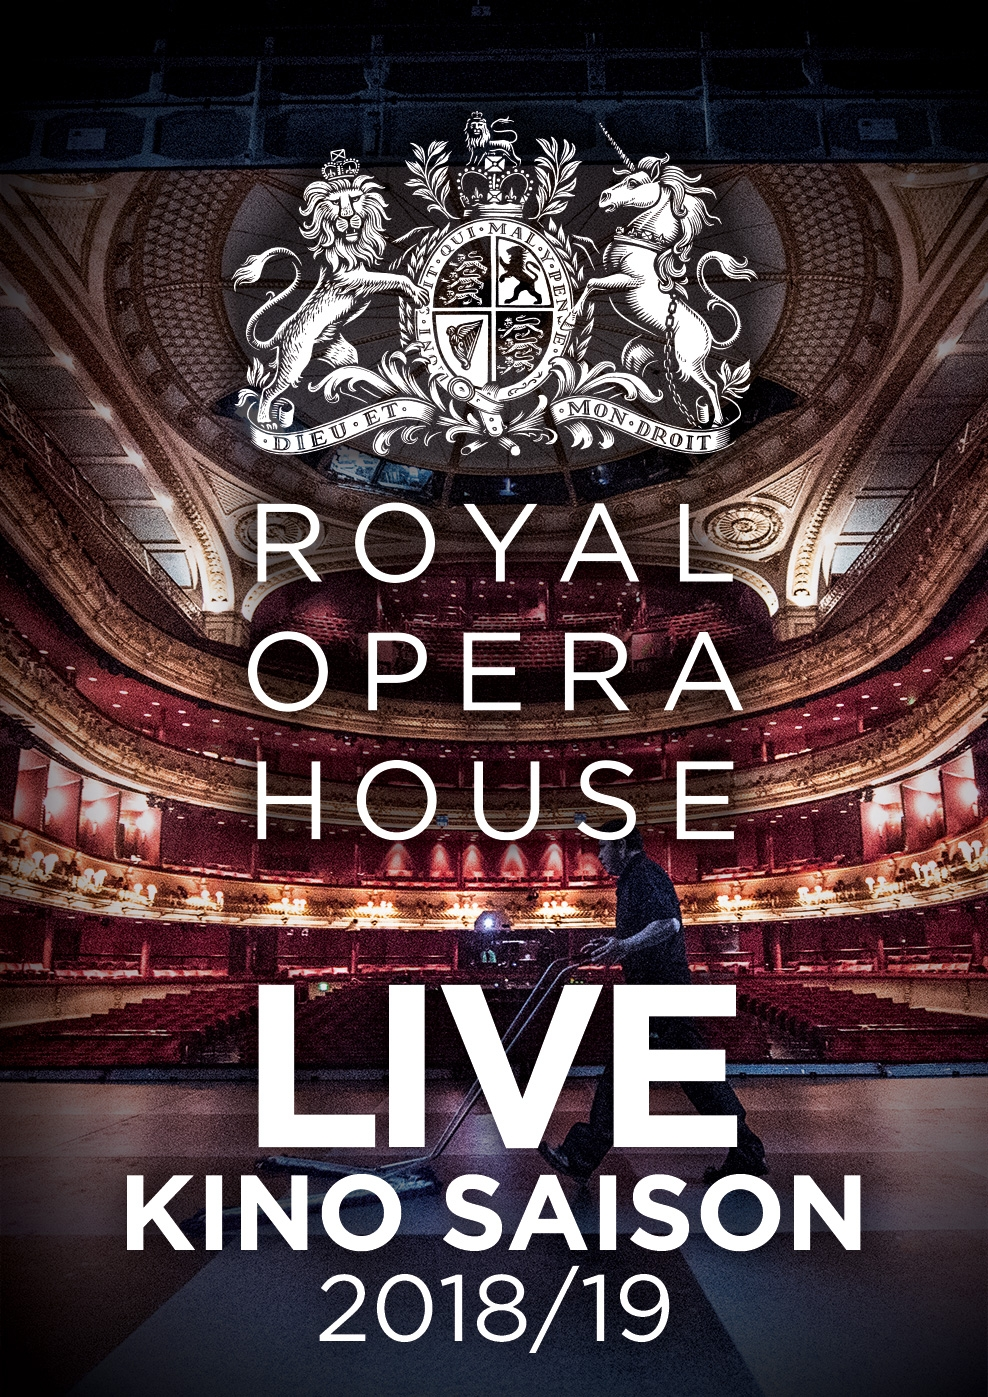 Royal Opera House 2018/19: La Forza del Destino (Die Macht des Schicksals) (Poster)